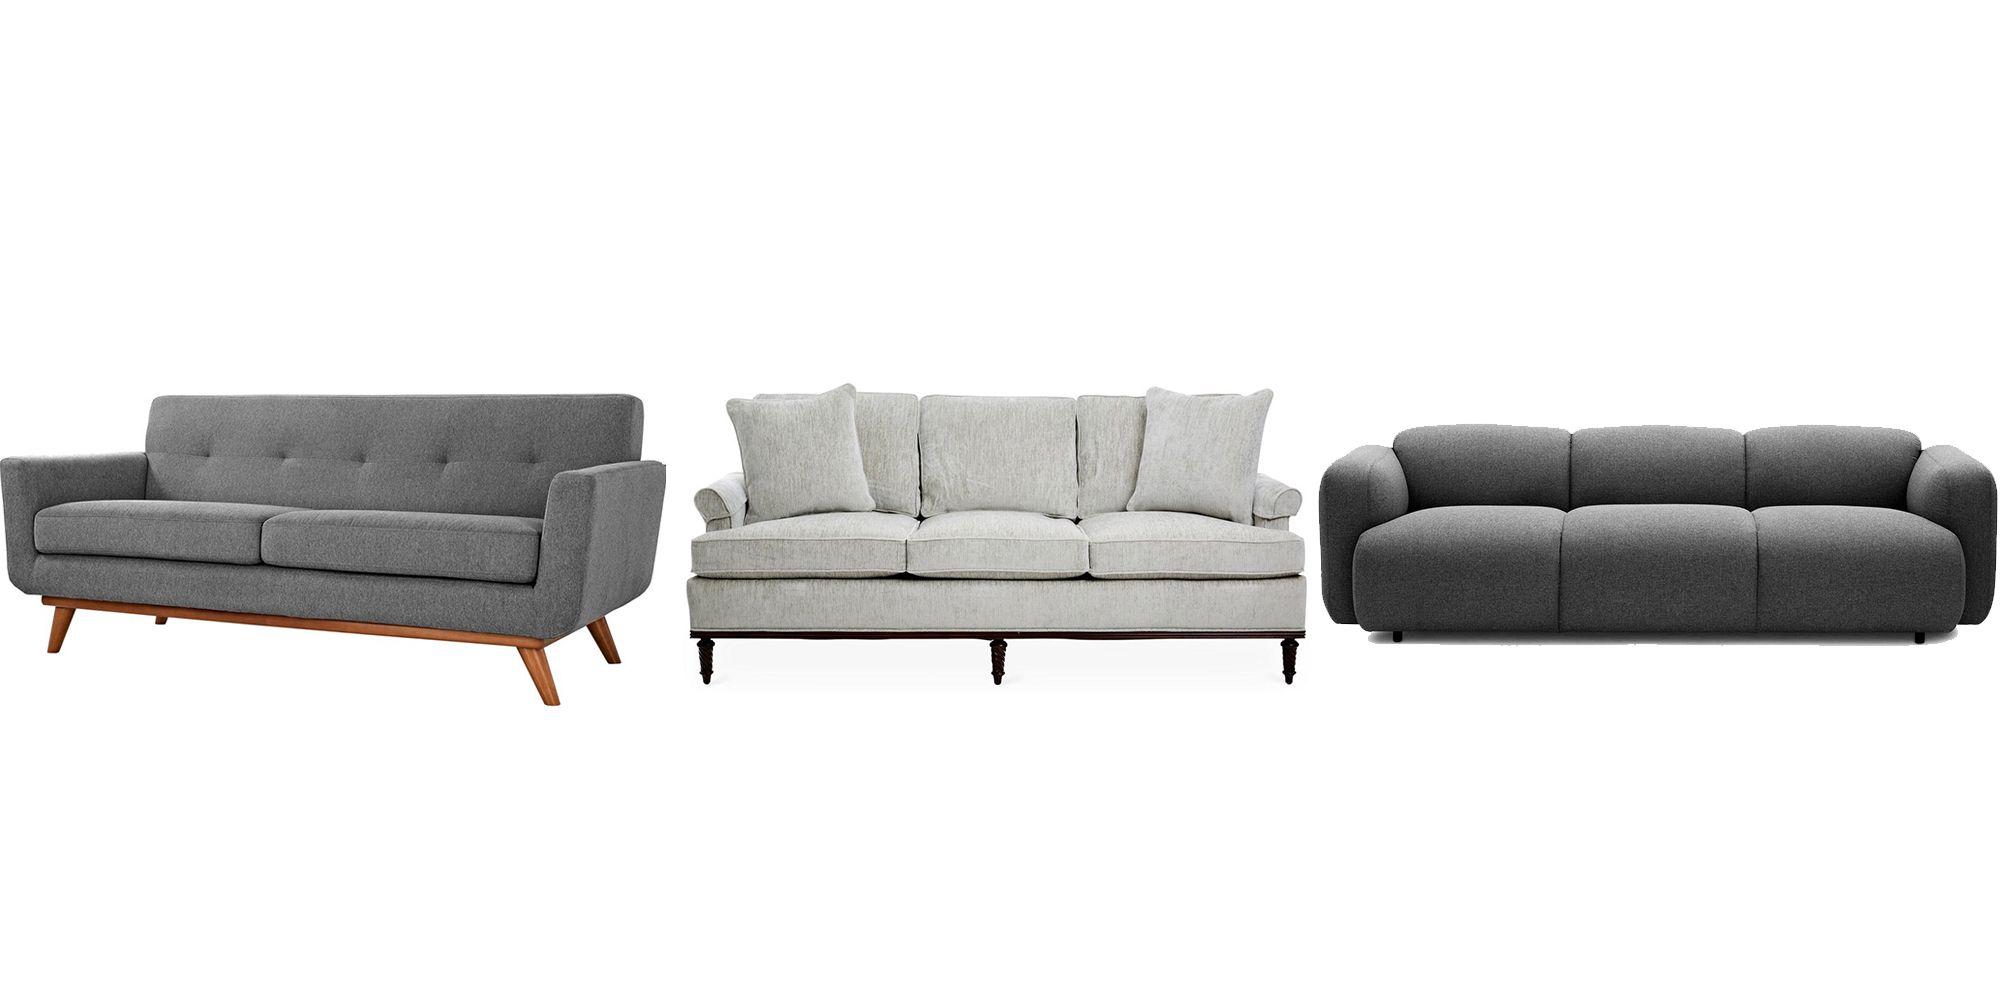 Great Grey Sofa